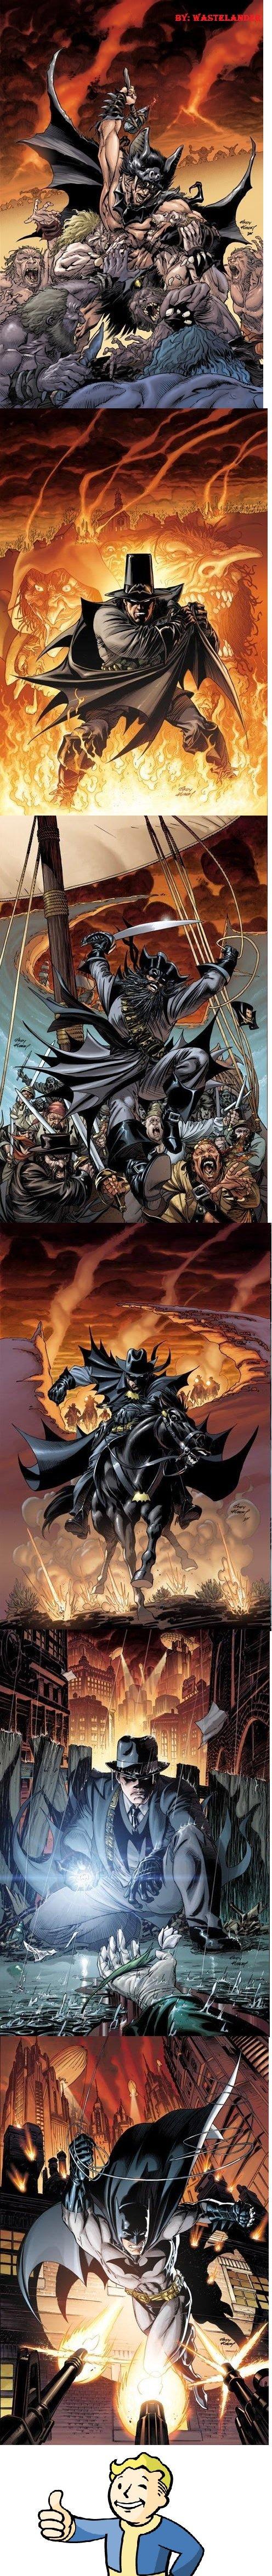 The Evolution of Batman. You've heard of human evolution, maybe even the evolution of dance, but now look at this... REPOST the evolution of batman throughout history epic change superhero